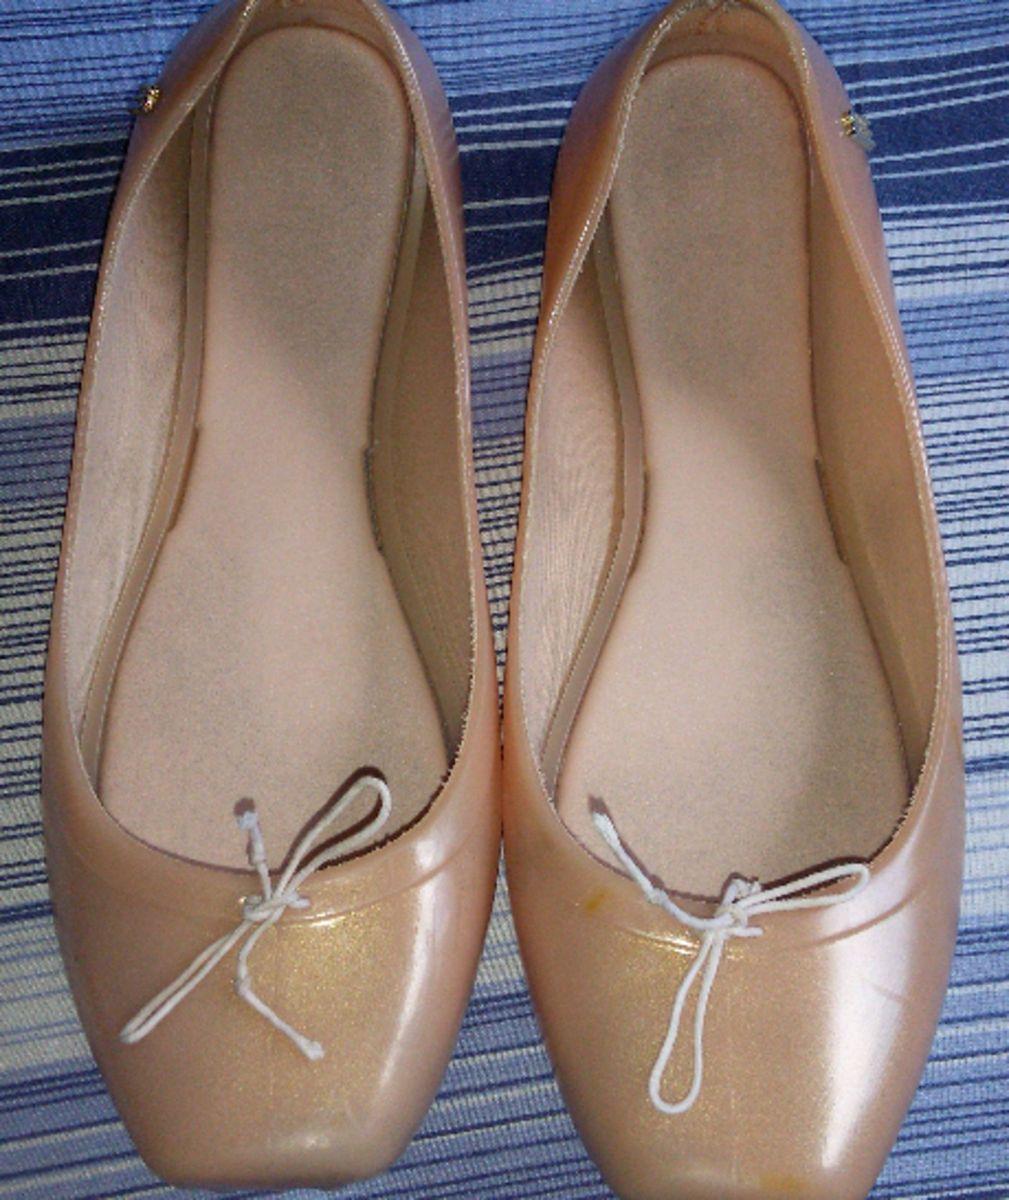 306dd042e3 melissa ballet 33 34 - sapatilha melissa.  Czm6ly9wag90b3muzw5qb2vplmnvbs5ici9wcm9kdwn0cy82mzi5njqvnzcxymvlzwyynmi5ztmwzdqxmdgzmjy4ymfmymi2zjuuanbn  ...